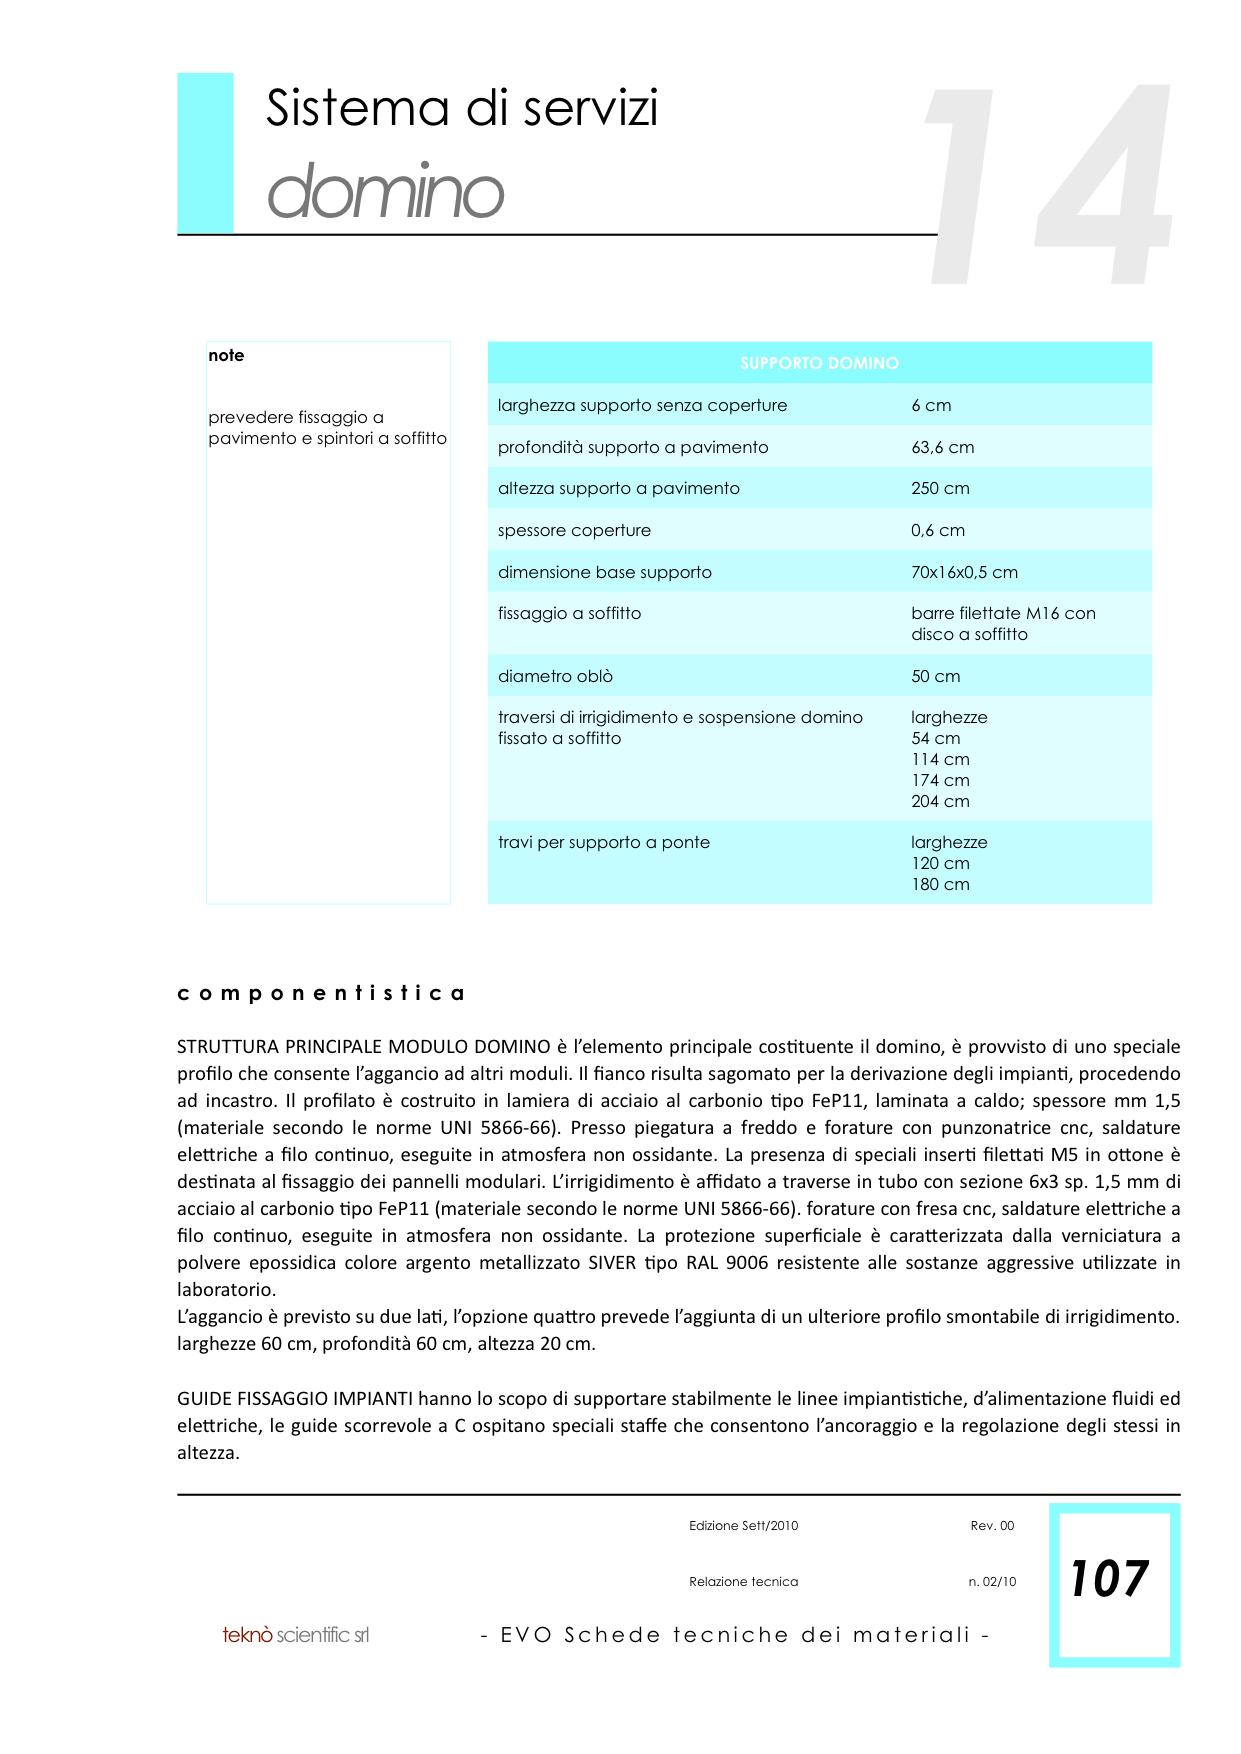 EVO Schede Tecniche materiali copia 7.png